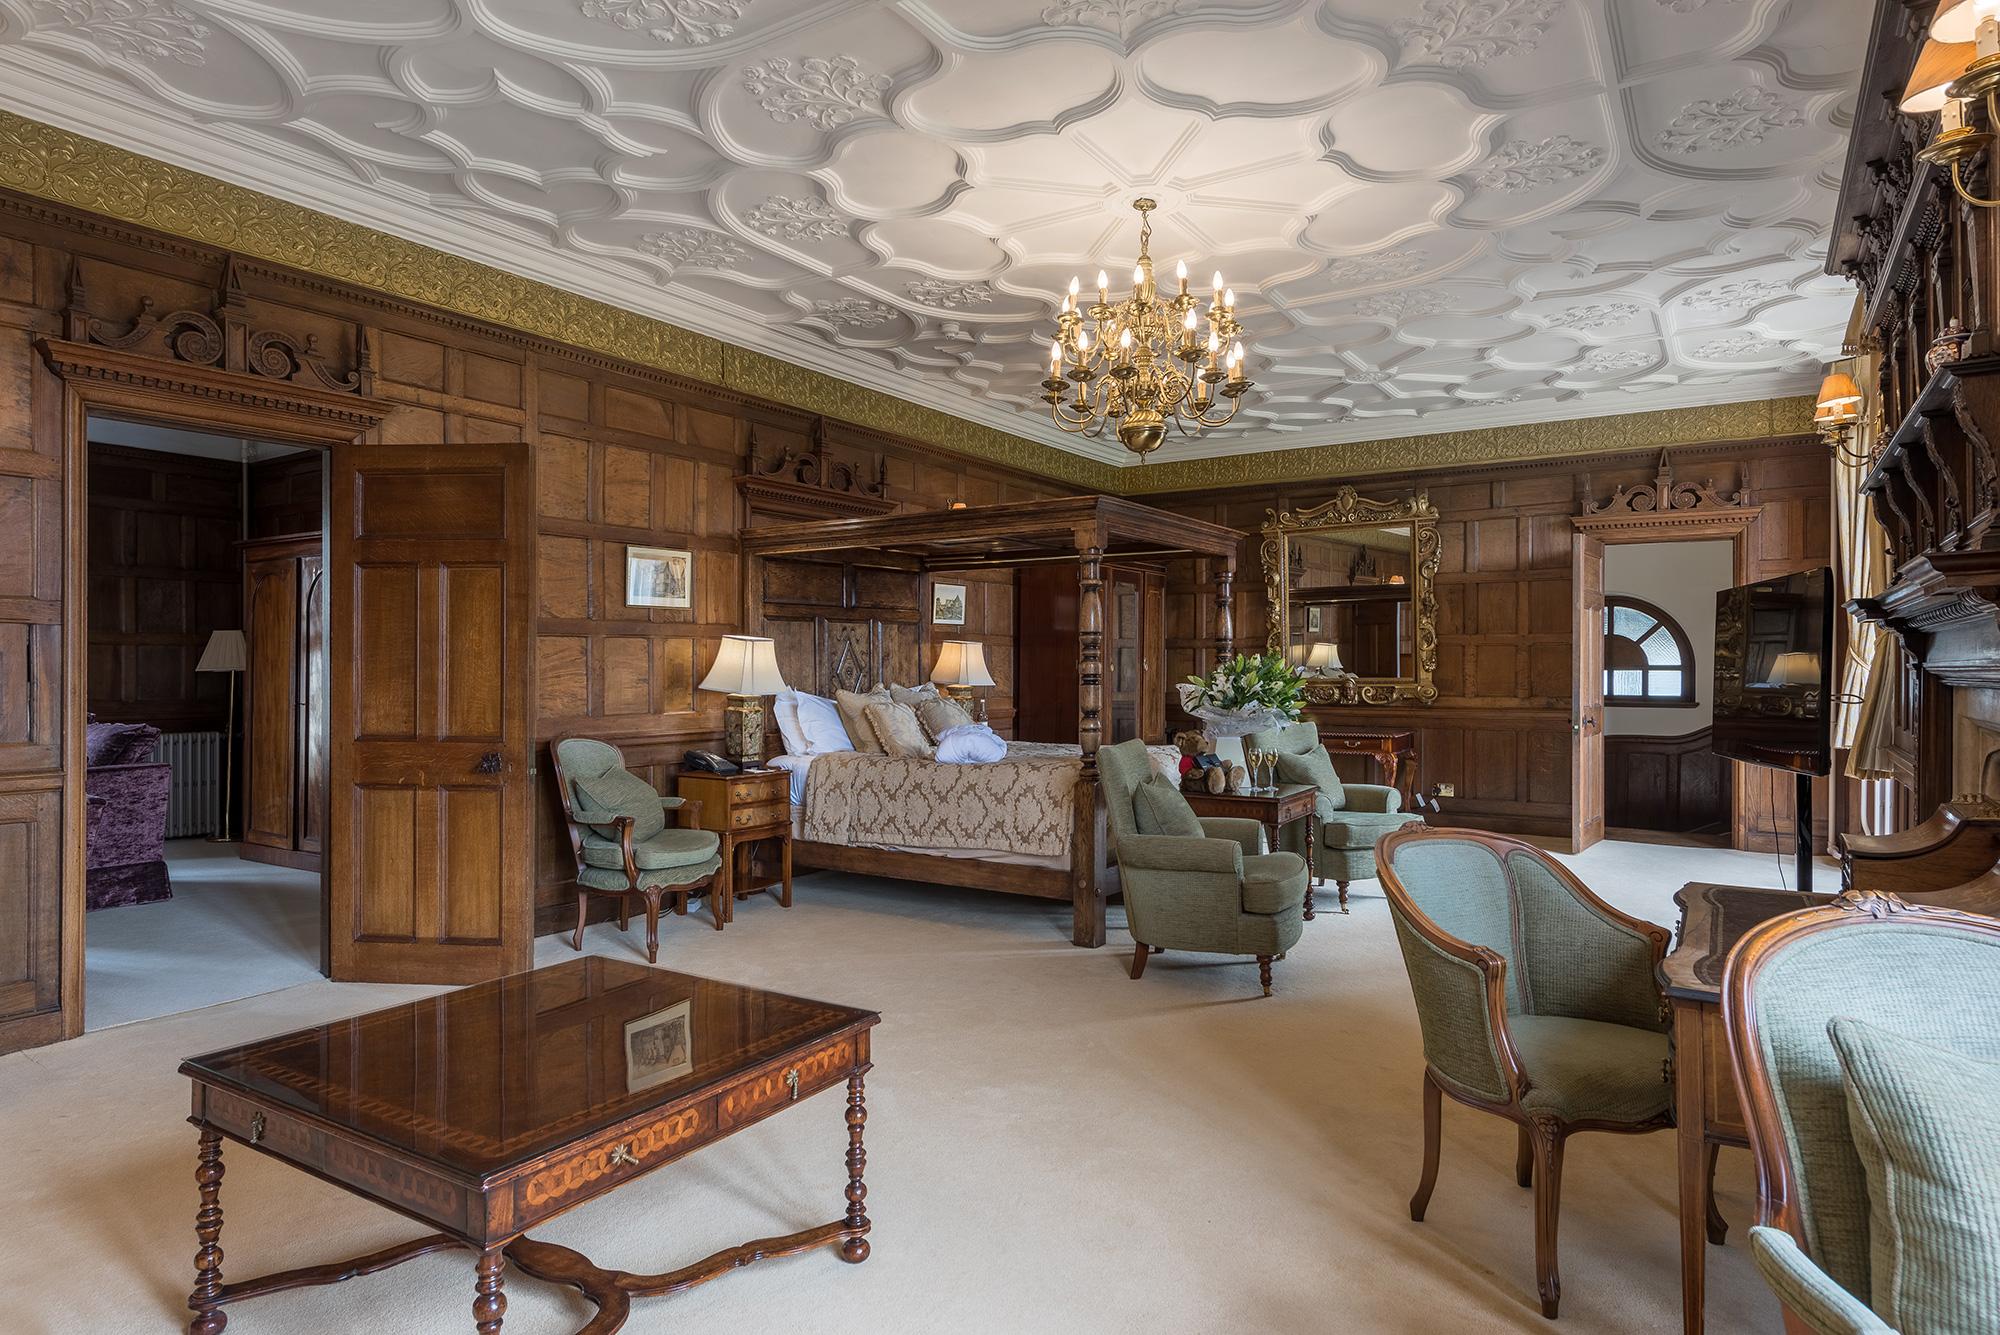 hotel-grand-bedroom-photography.jpg